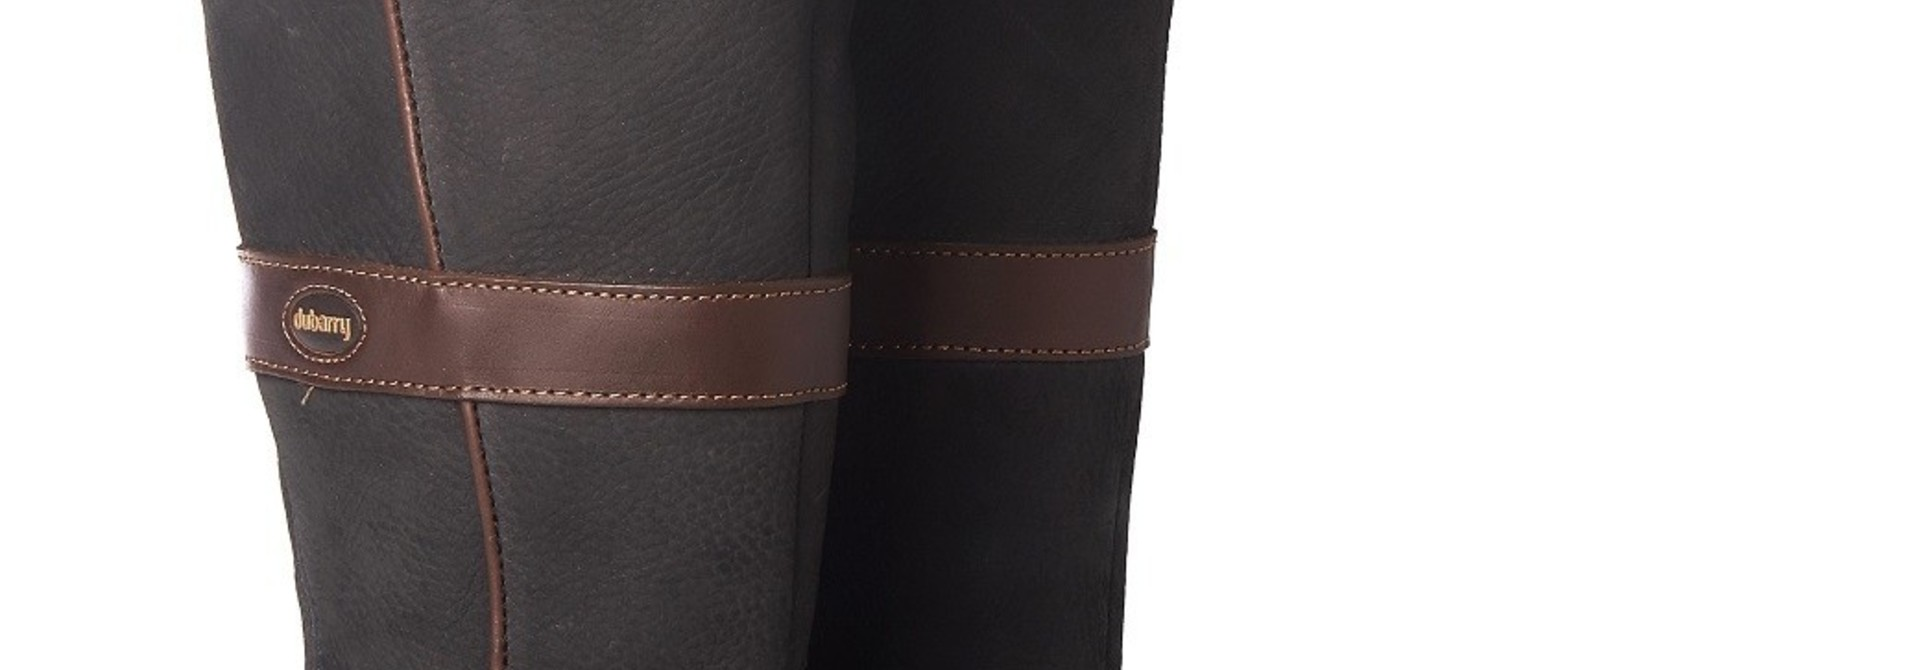 Dubarry Longford - Black/Brown